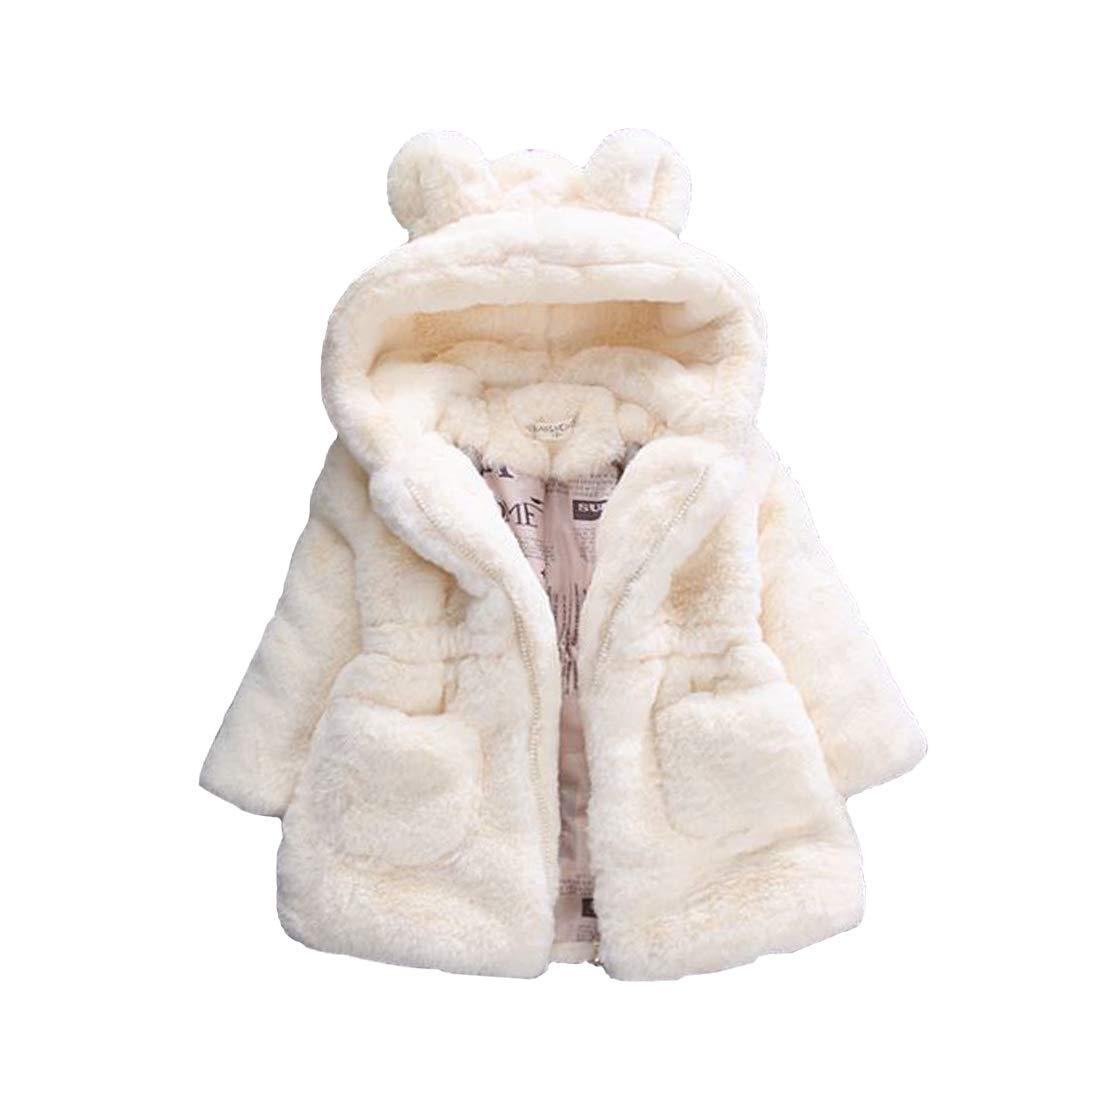 DorkasDE M/ädchen Mantel Winterjacke Kunstpelz Jacke Fellmantel Warm Jacke mit Kapuze